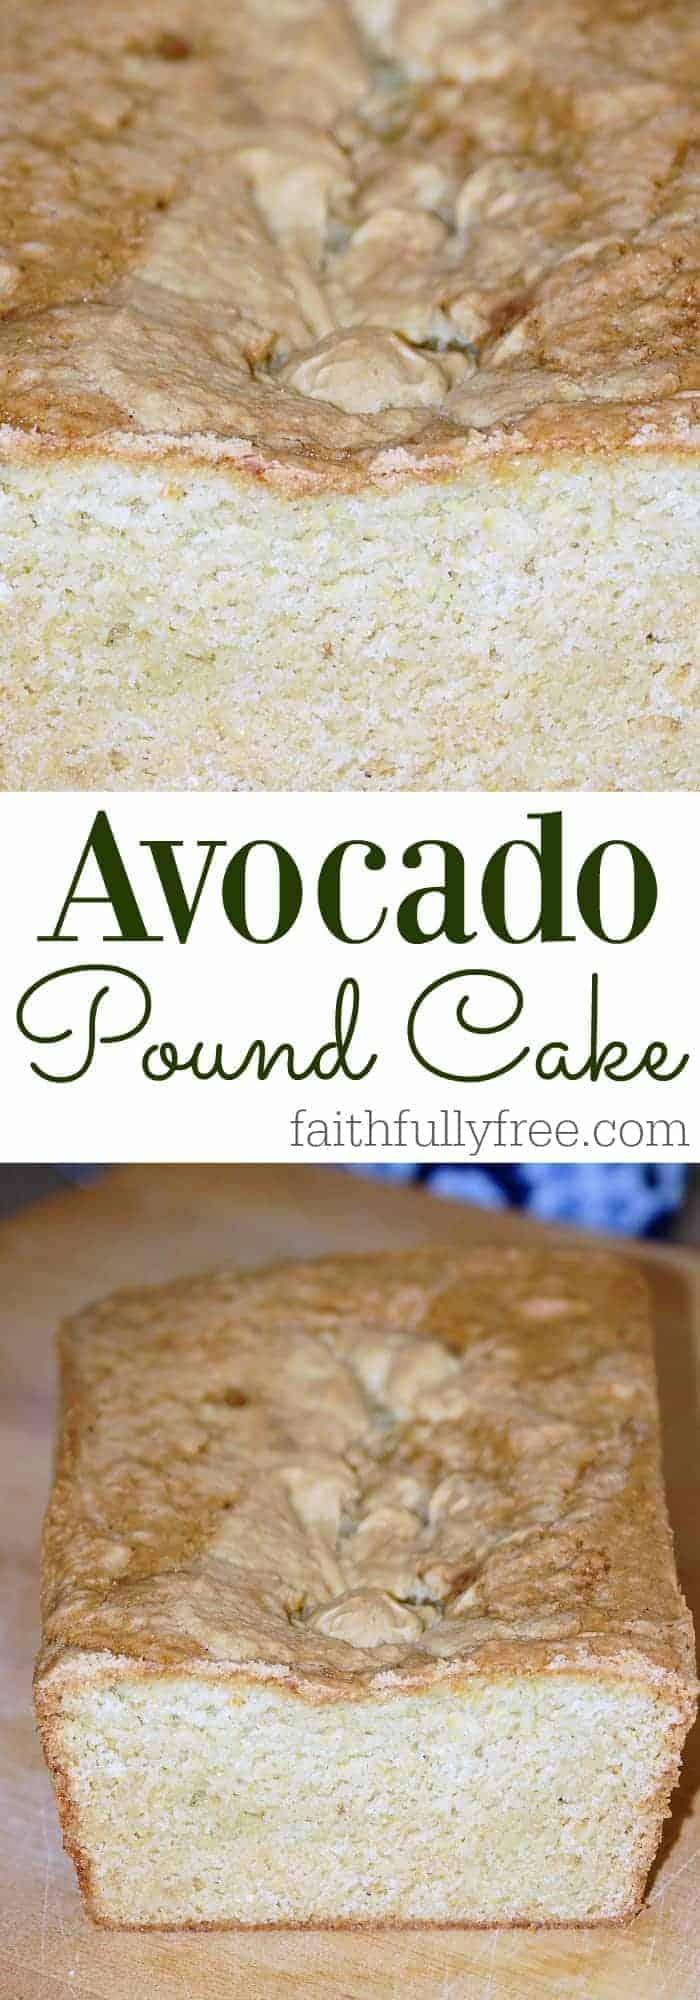 Super Moist Avocado Pound Cake Recipe